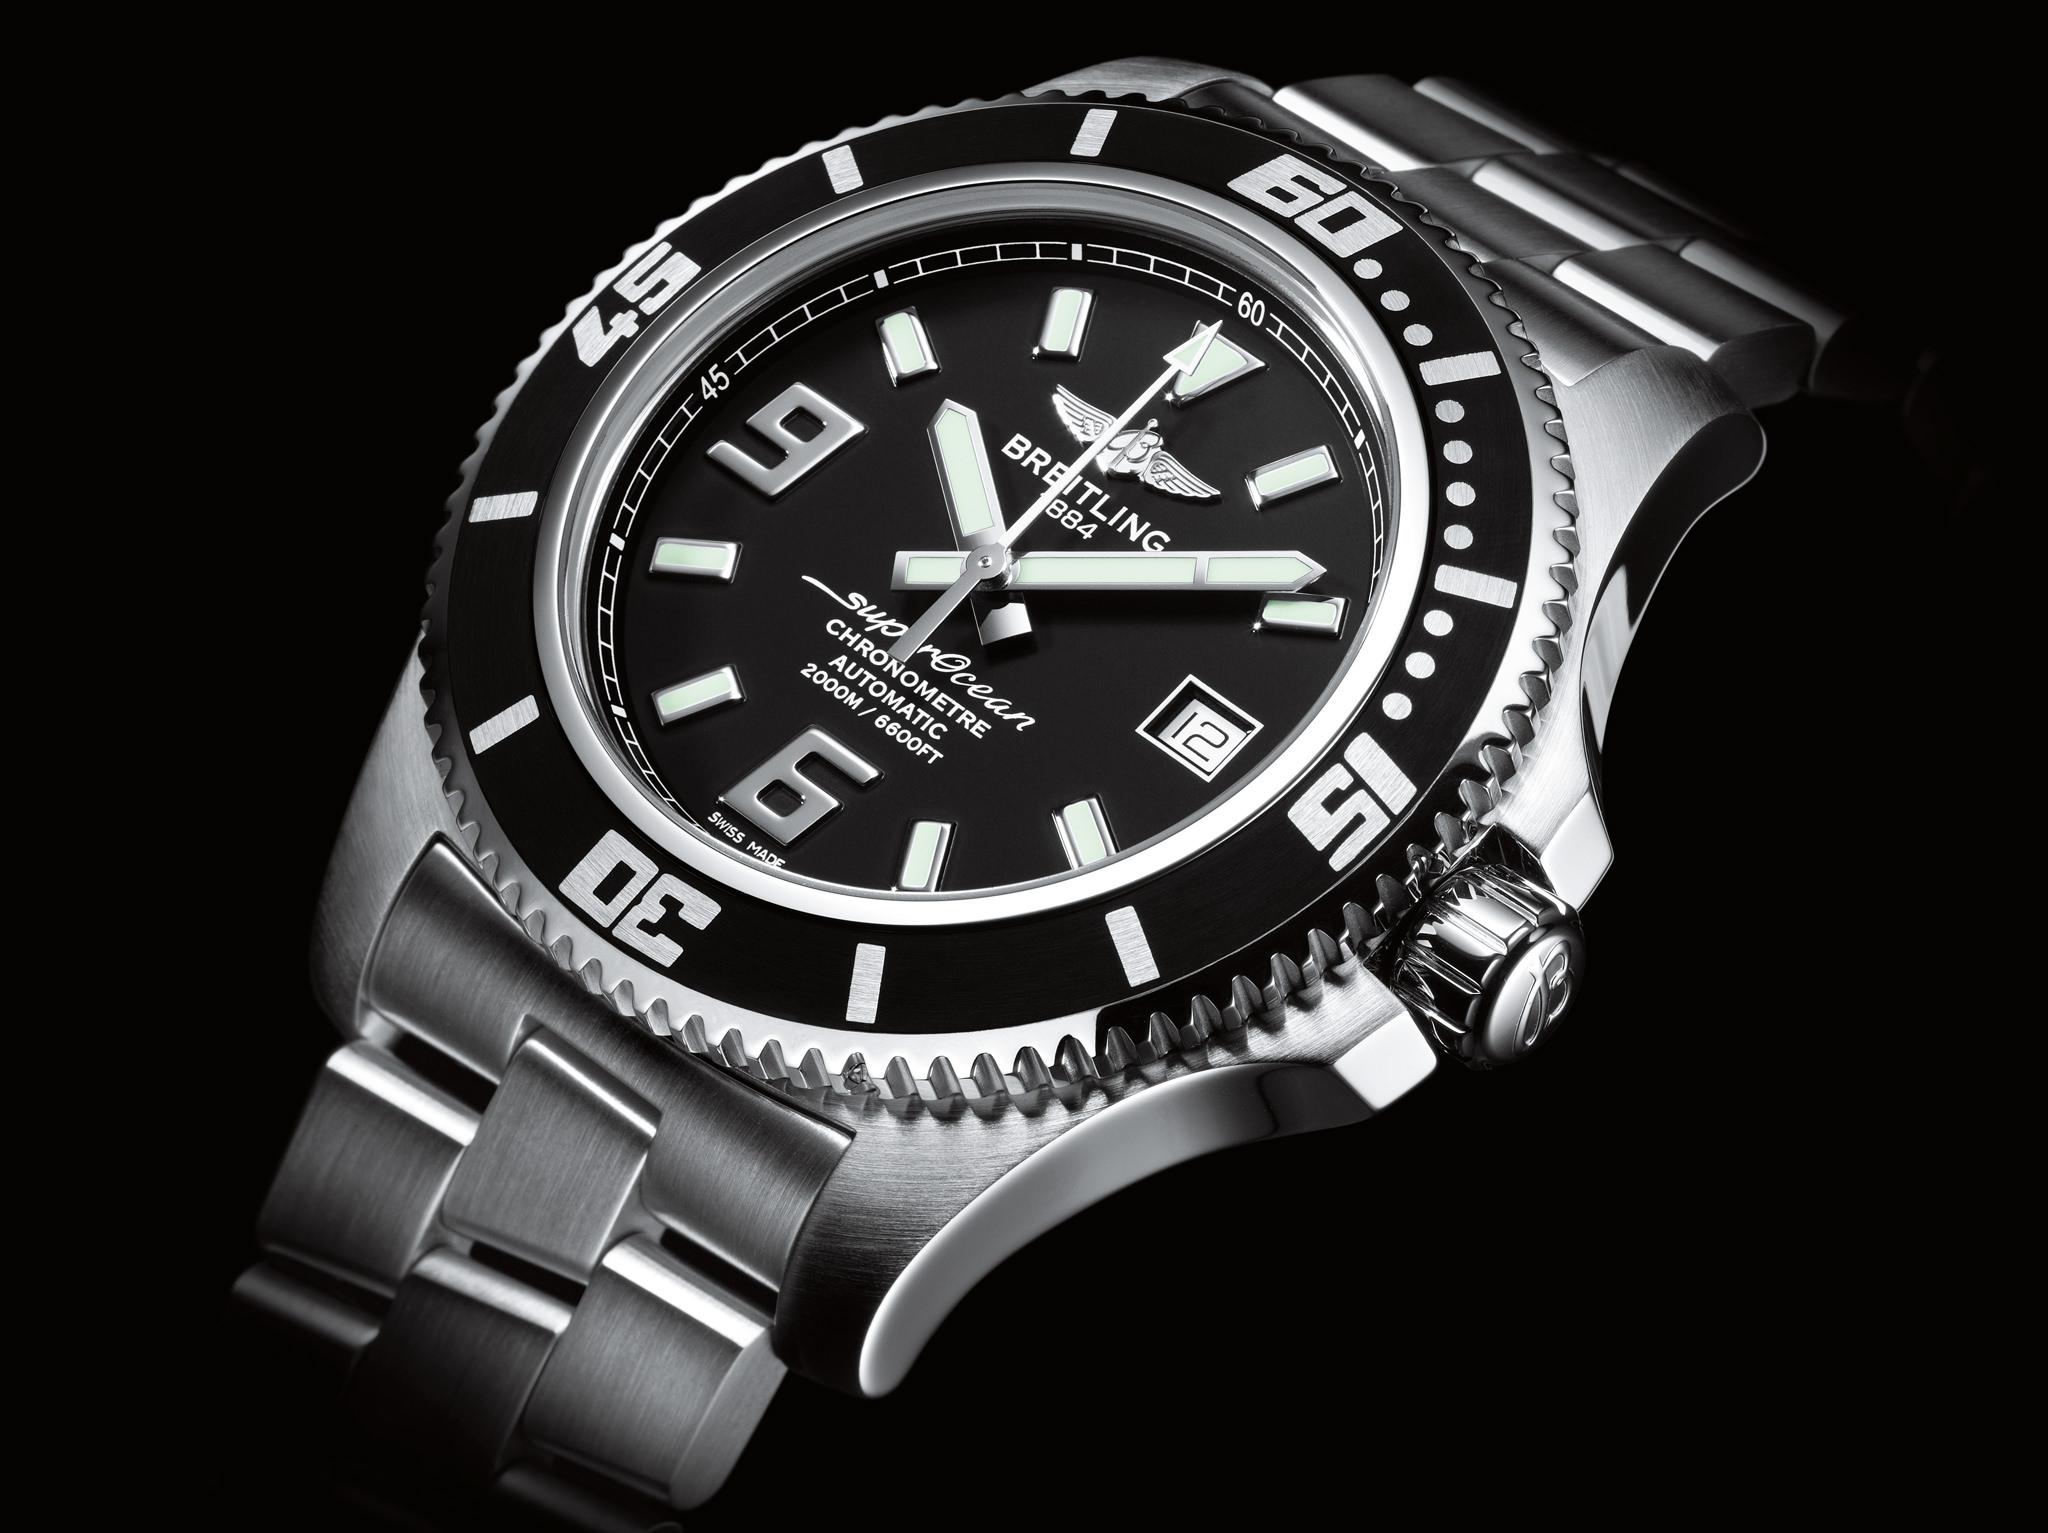 Breitling Superocean Ii 44 Edinburgh Watch Company